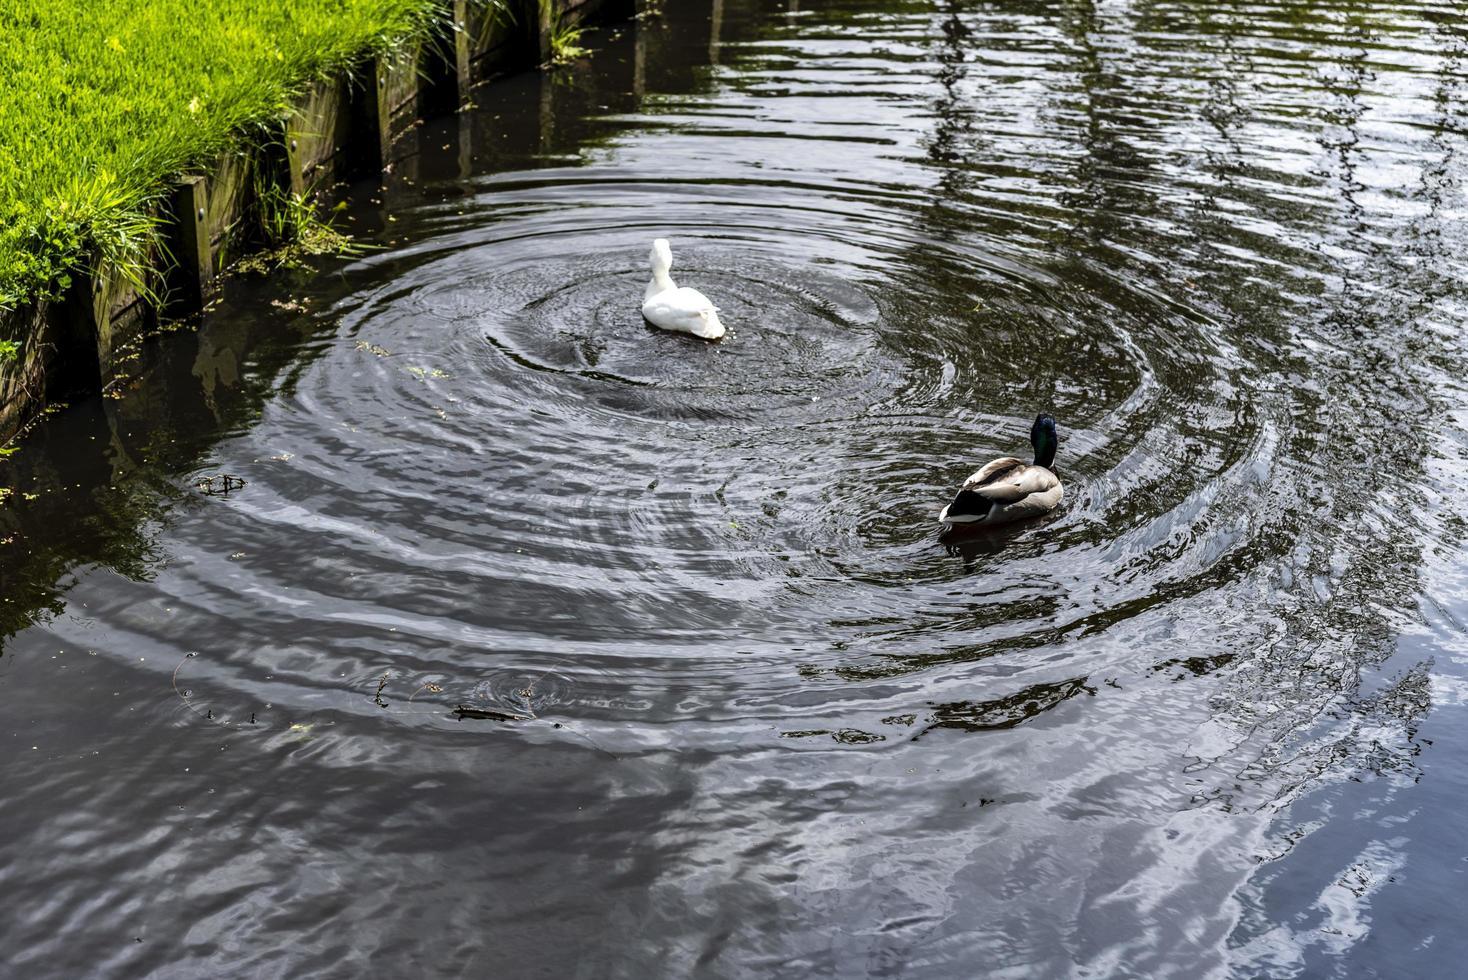 en vit gräsandand som simmar i dammen foto